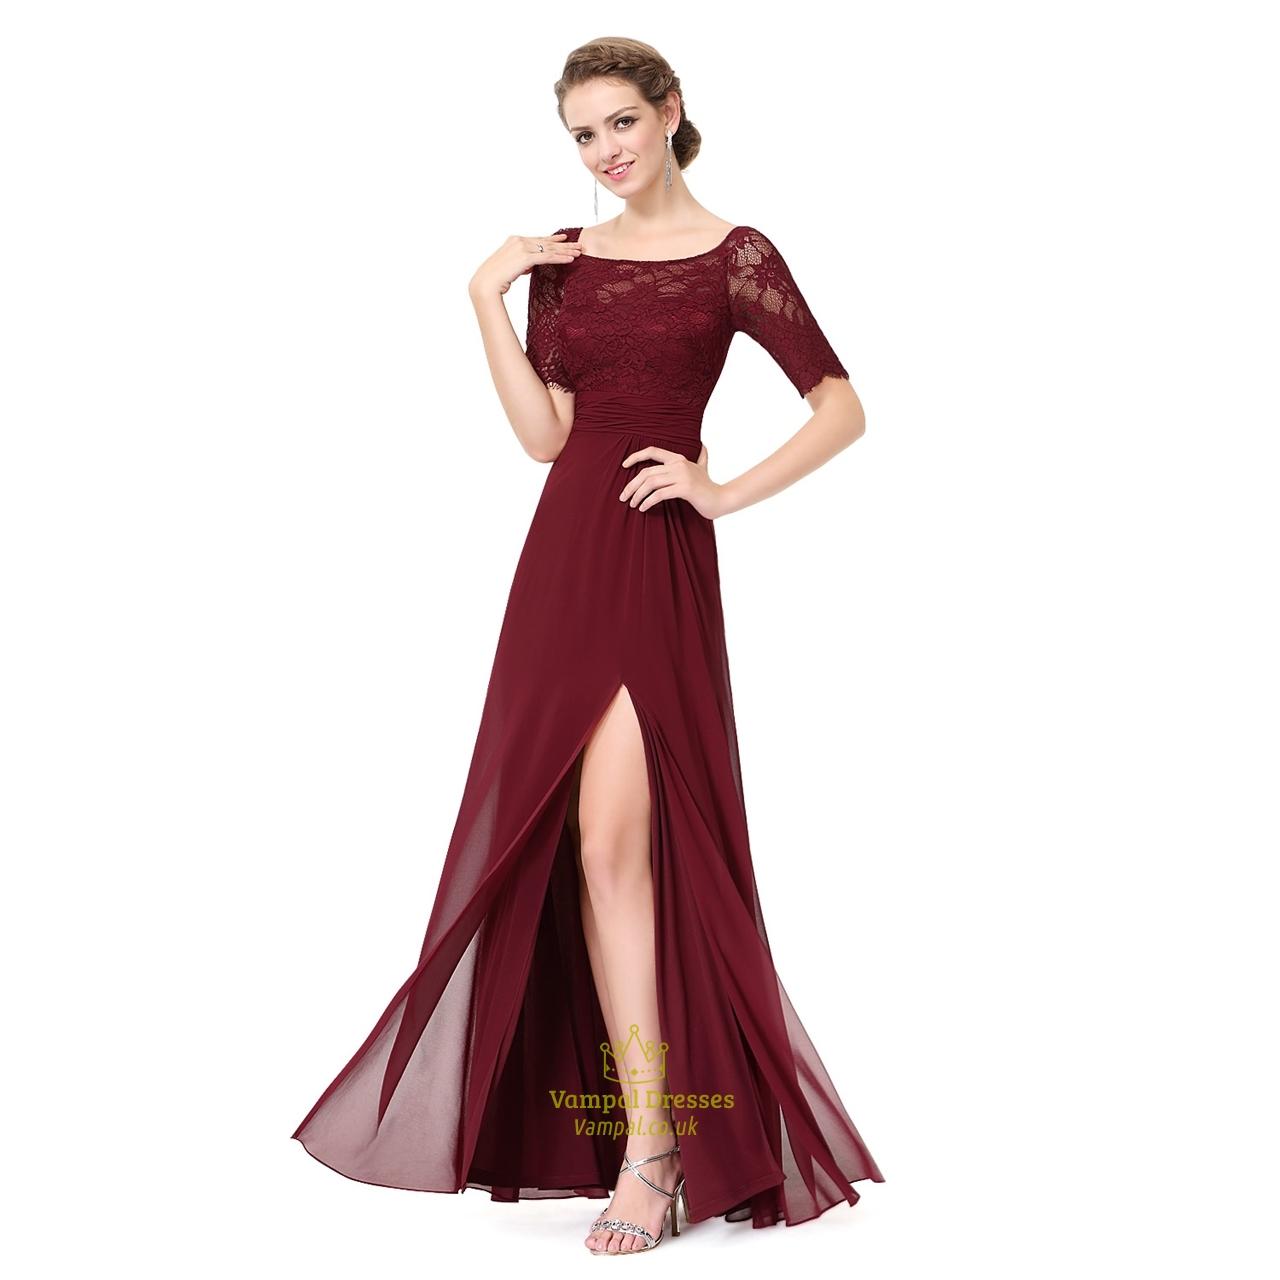 Burgundy Chiffon Lace Bodice Short Sleeves Bridesmaid